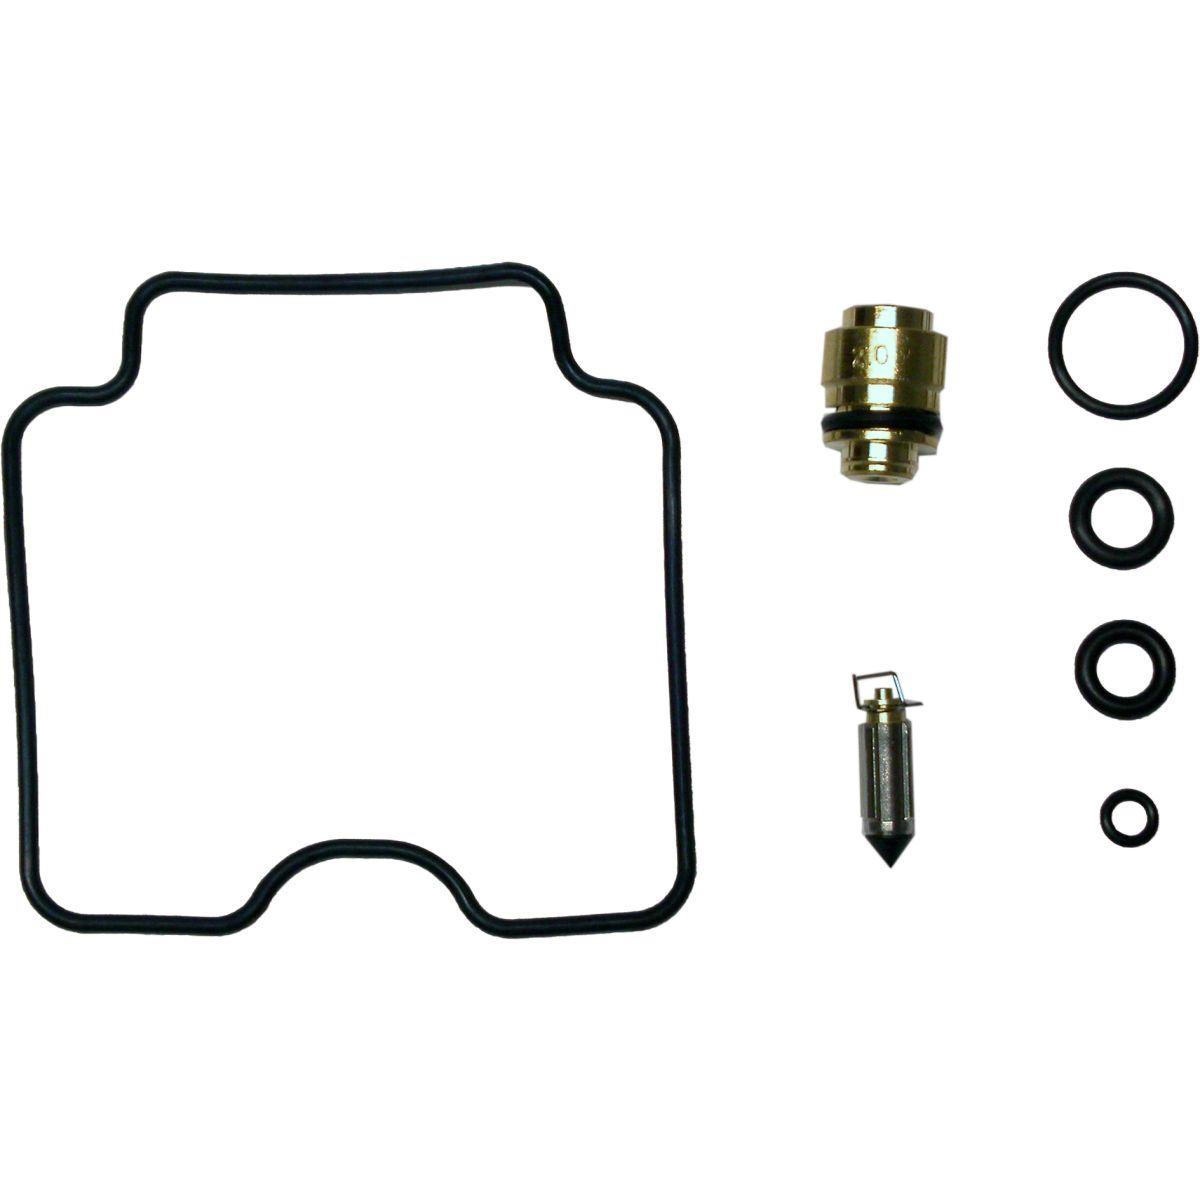 AW Motorcycle Parts. Carburettor Repair Kit Suzuki GS500K